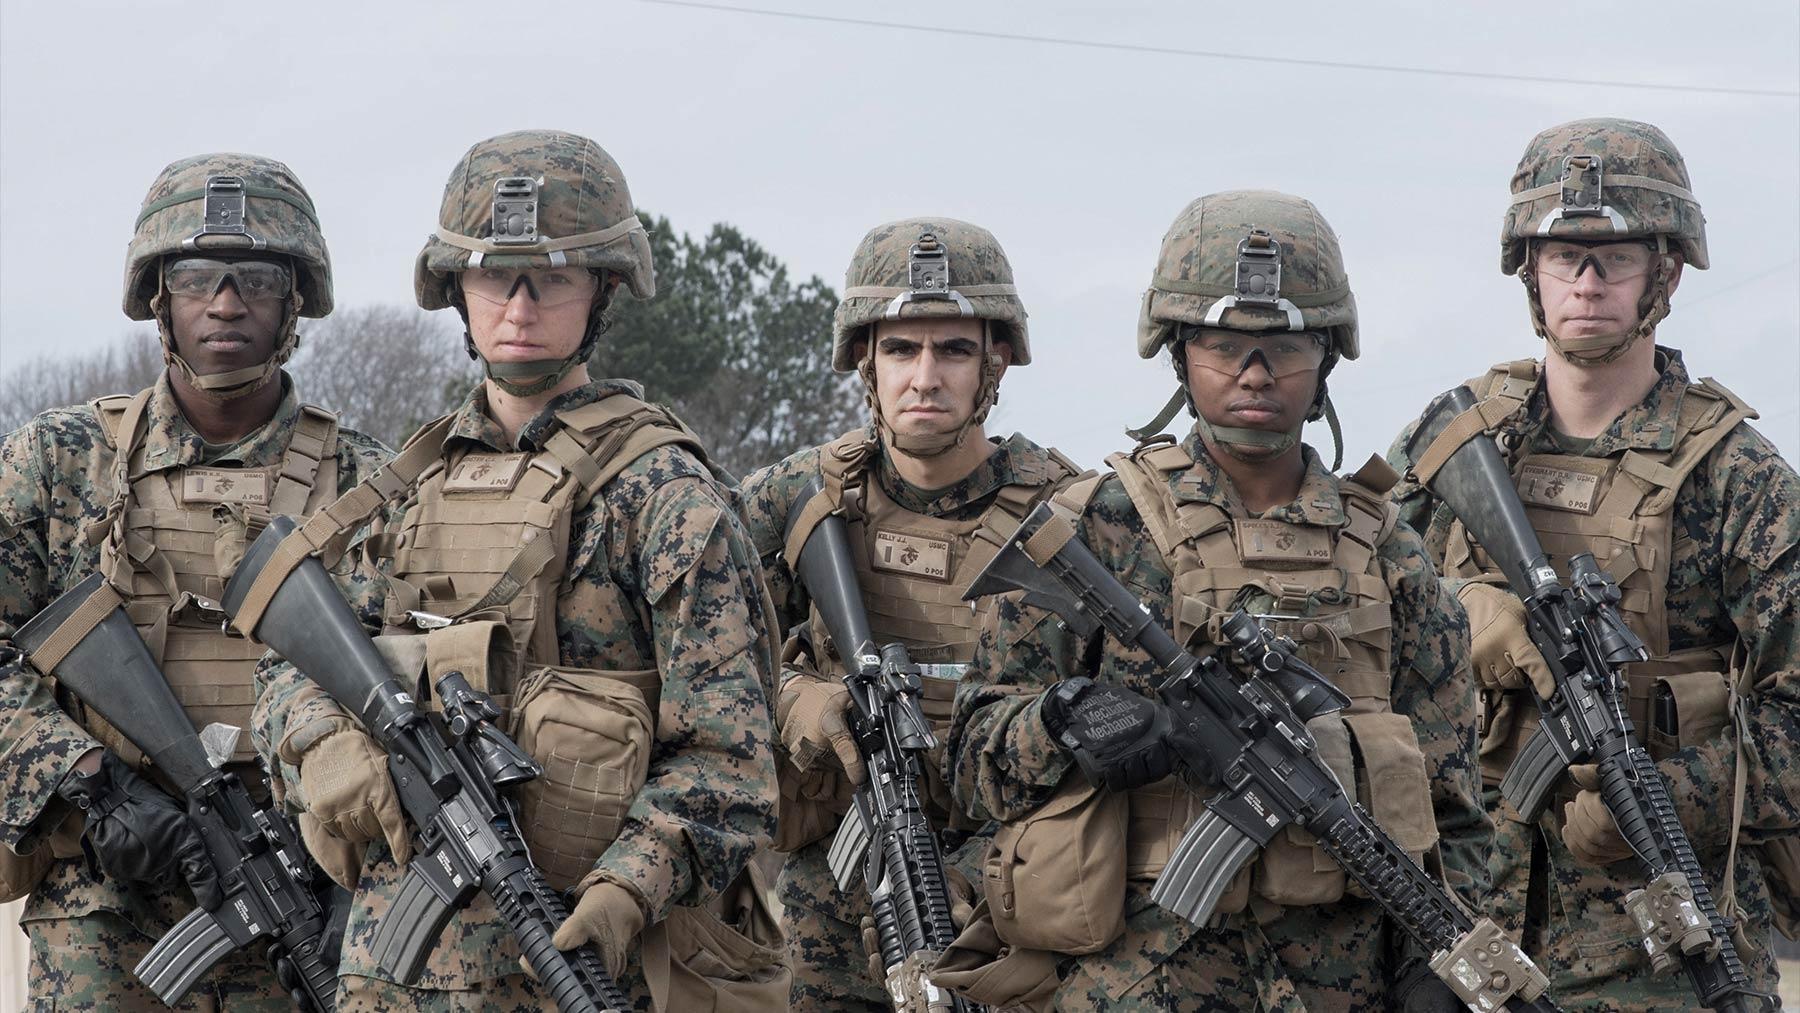 Marine Scholarship Programs | Marines.com